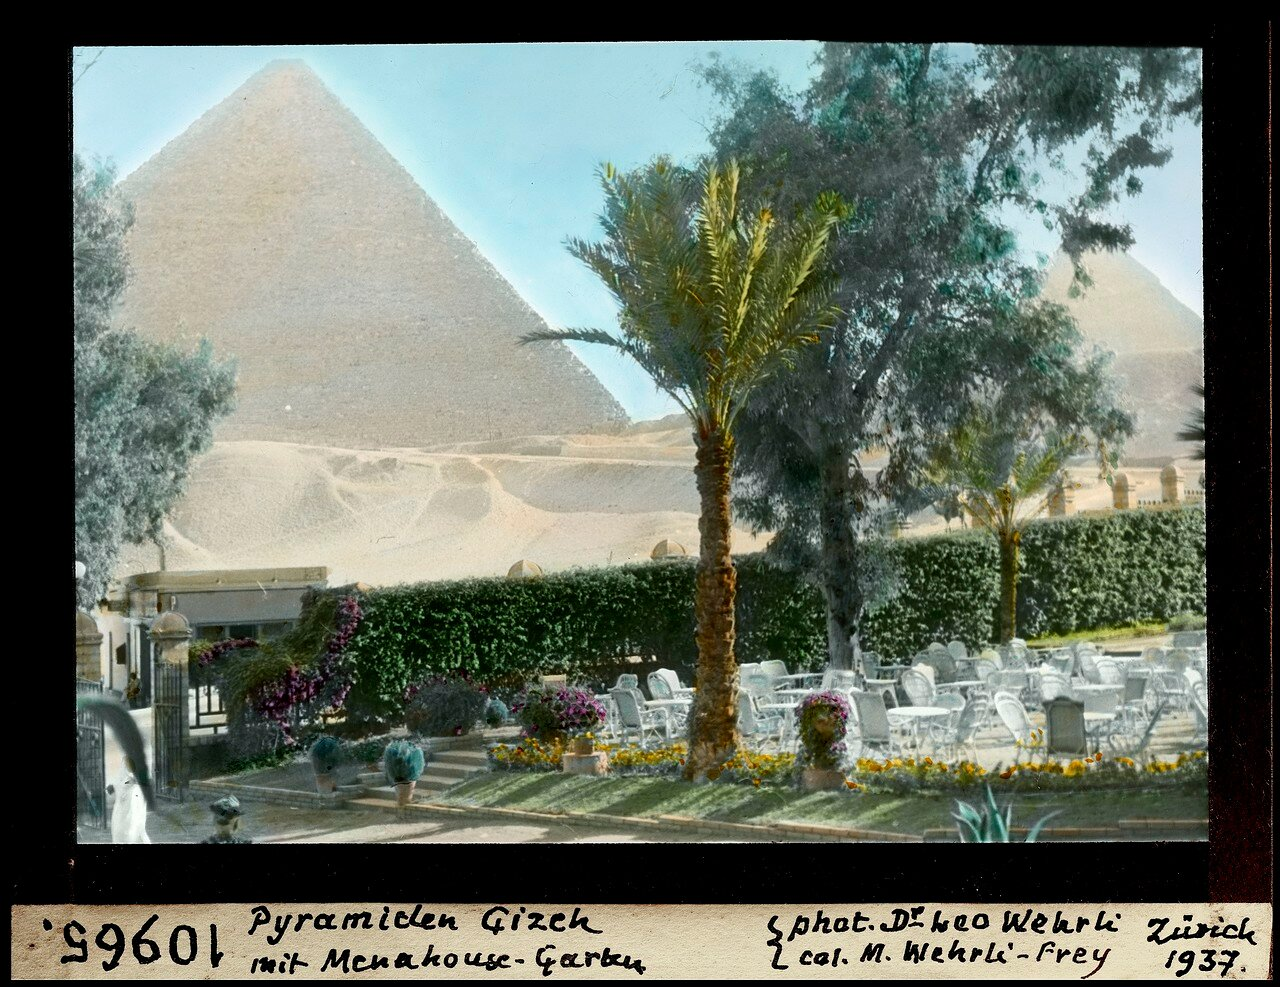 Гиза. Пирамида Хеопса и сад отеля Mena House